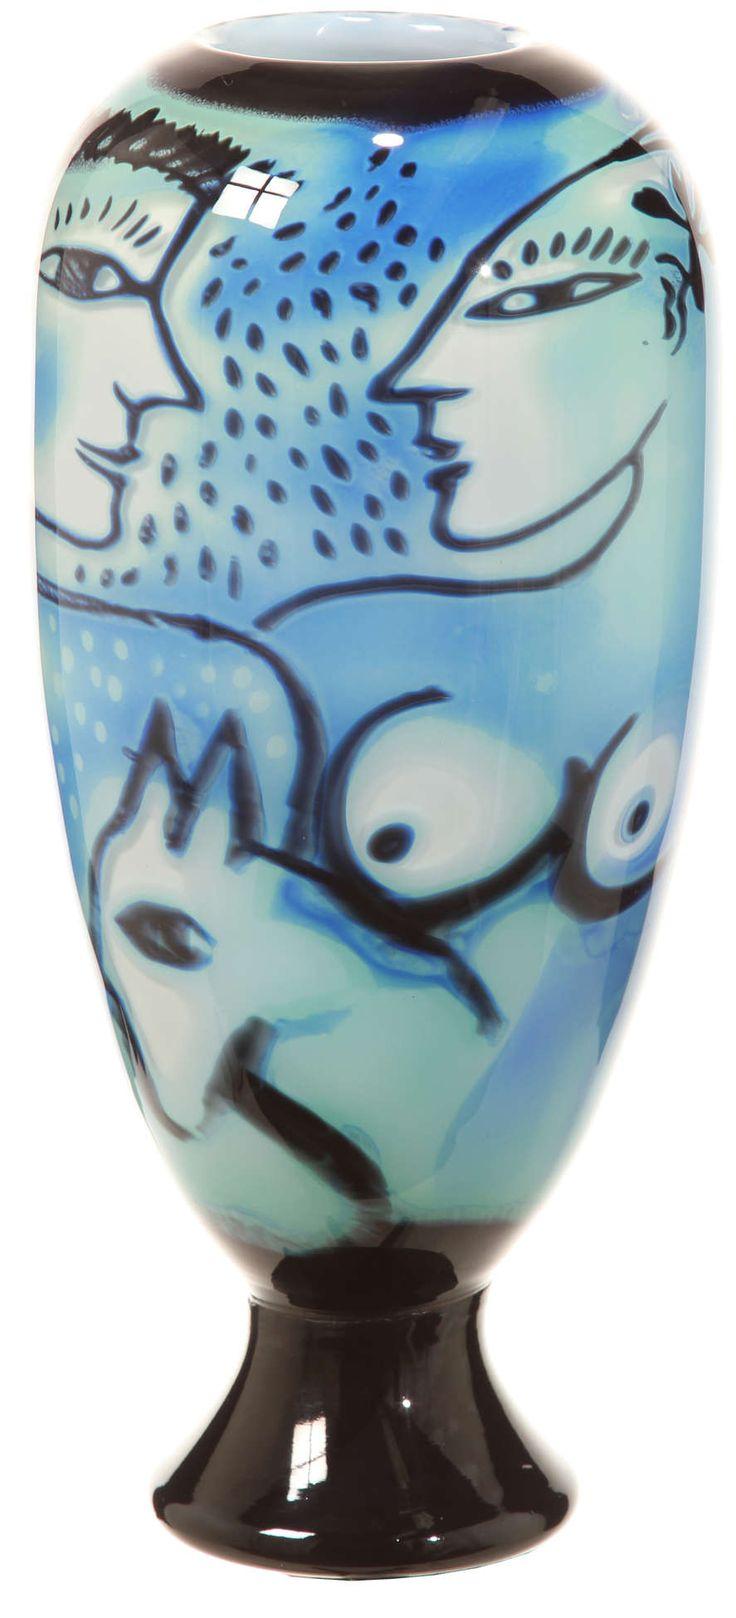 Graal Vase, by Ulrica Hydman-Vallien. Kosta Boda Glass, Sweden